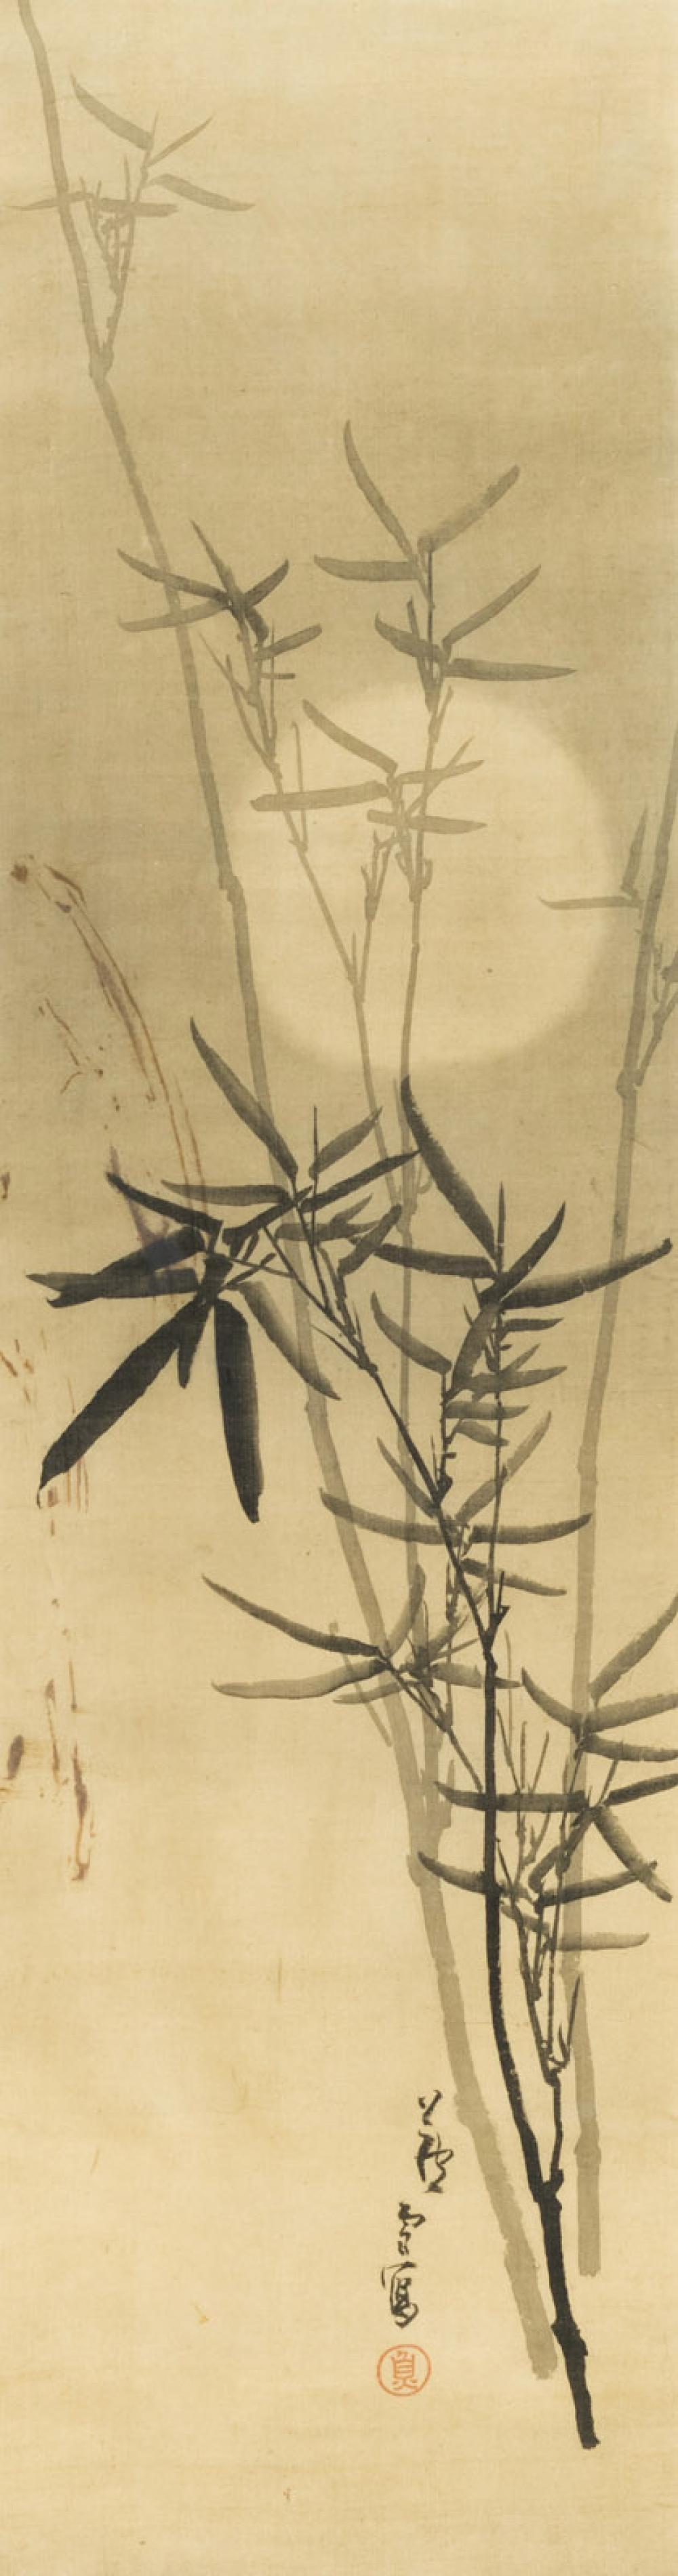 IN THE STYLE OF NAGASAWA RÔSETSU (1754-1799)